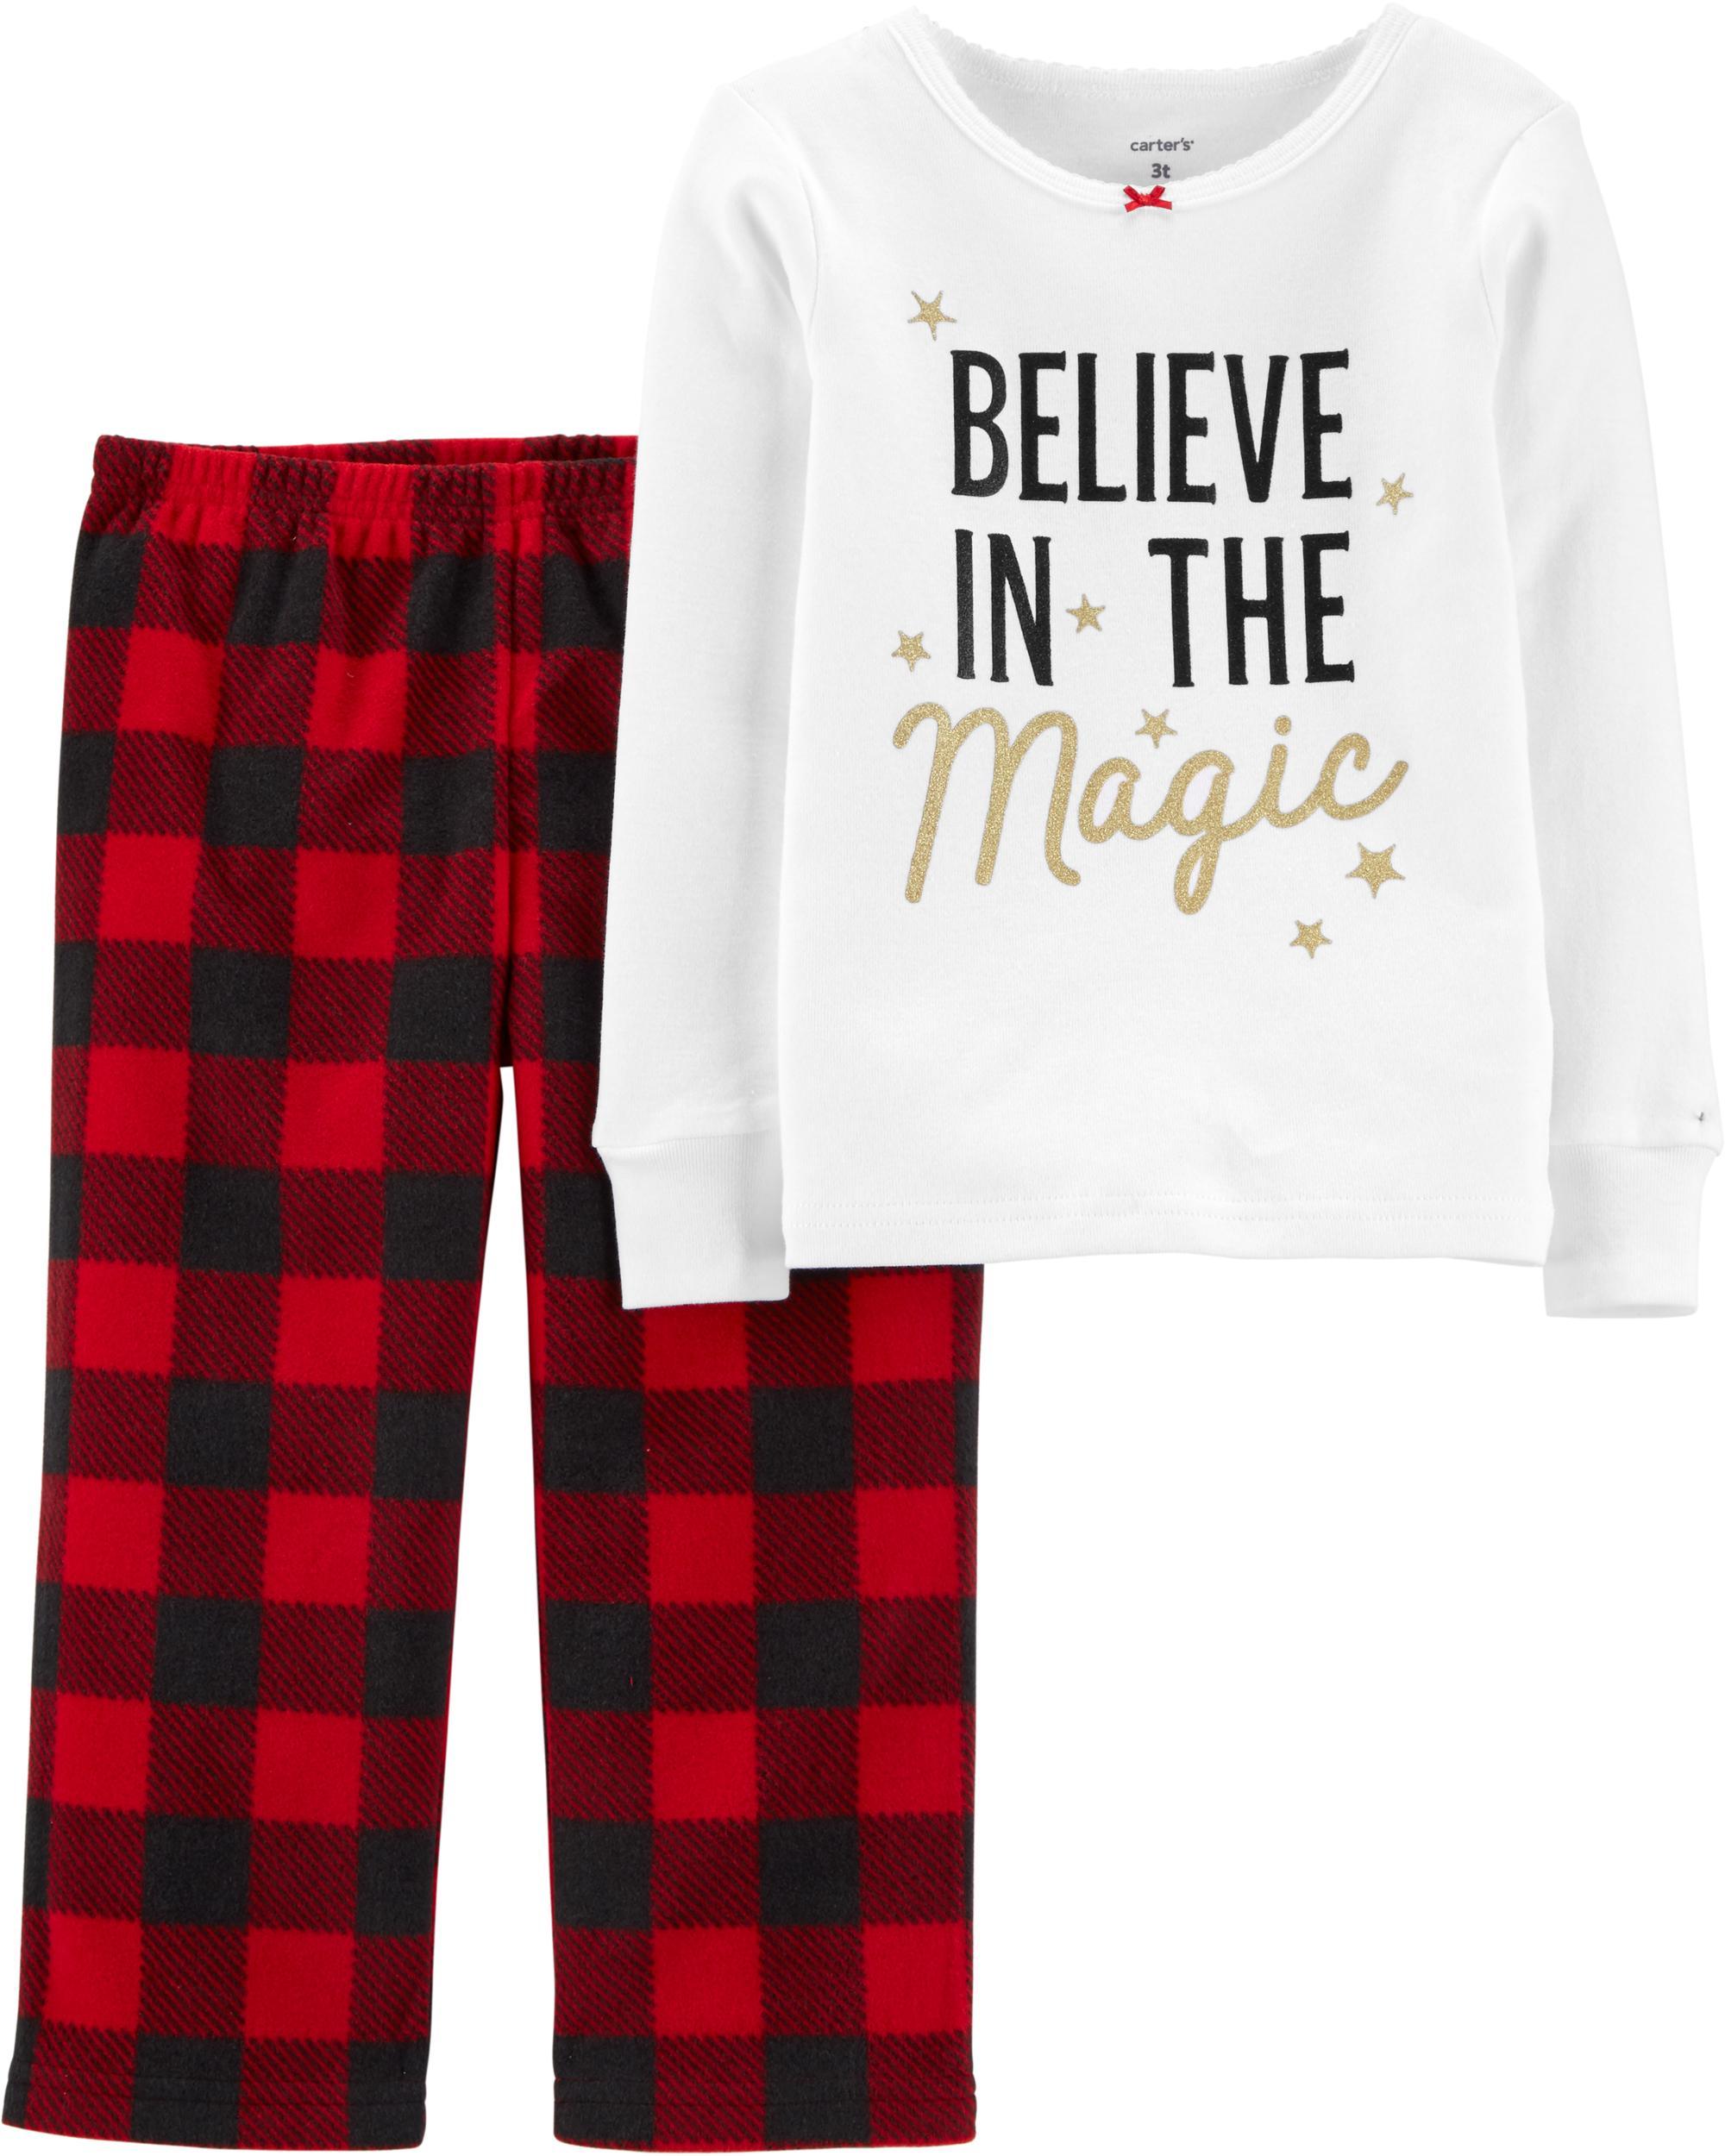 Christmas Fleece.2 Piece Christmas Magic Snug Fit Cotton Fleece Pjs Carters Com